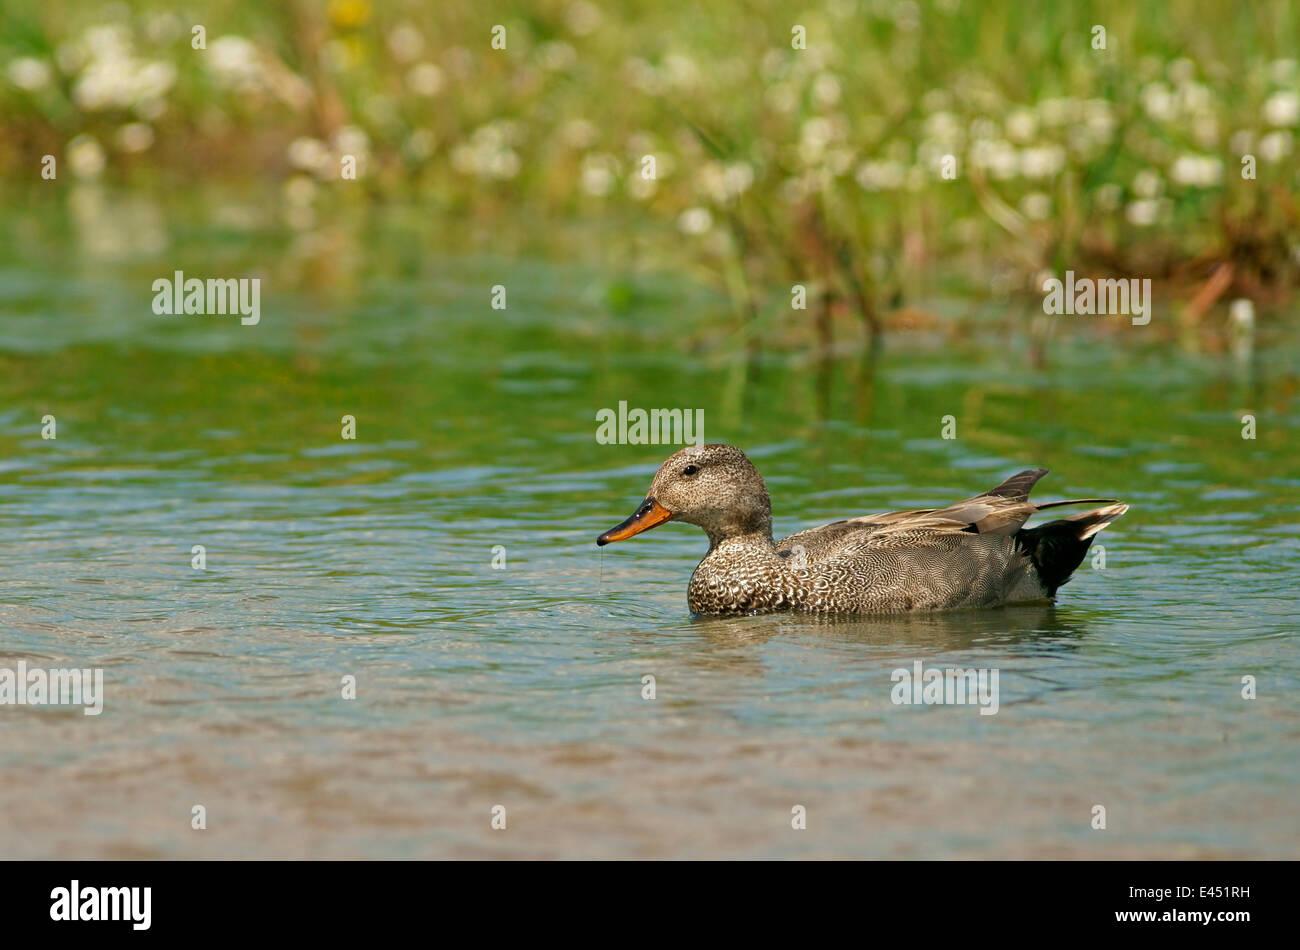 Gadwall (Anas strepera), drake, Mecklenburg-Western Pomerania, Germany - Stock Image